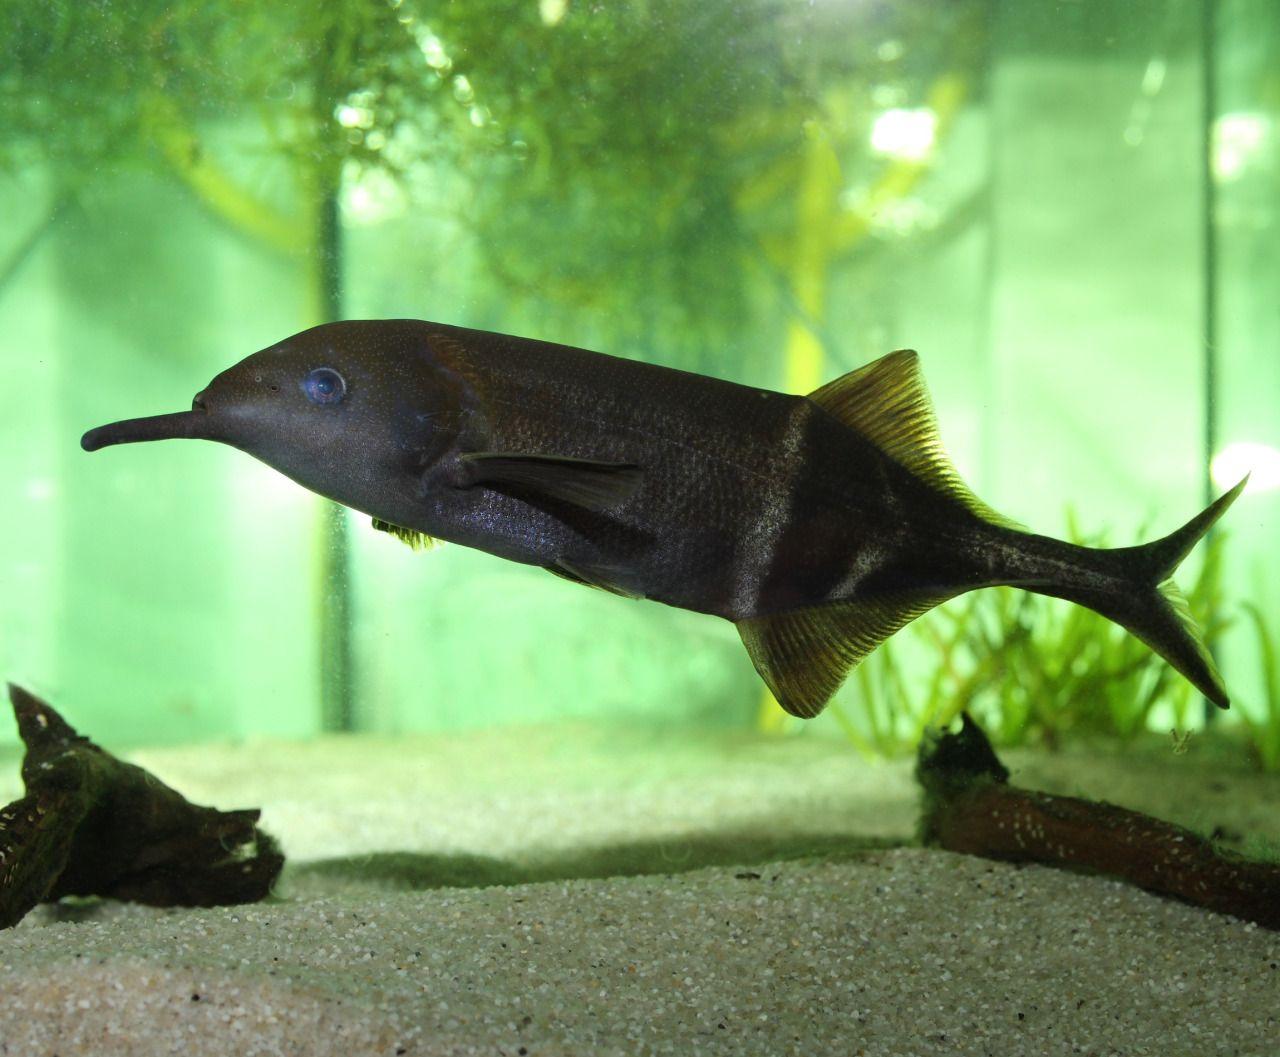 Freshwater fish looks like dolphin - Elephant Nosefish Peters Elephantnose Fish Is An African Freshwater Elephantfish In The Genus Gnathonemus